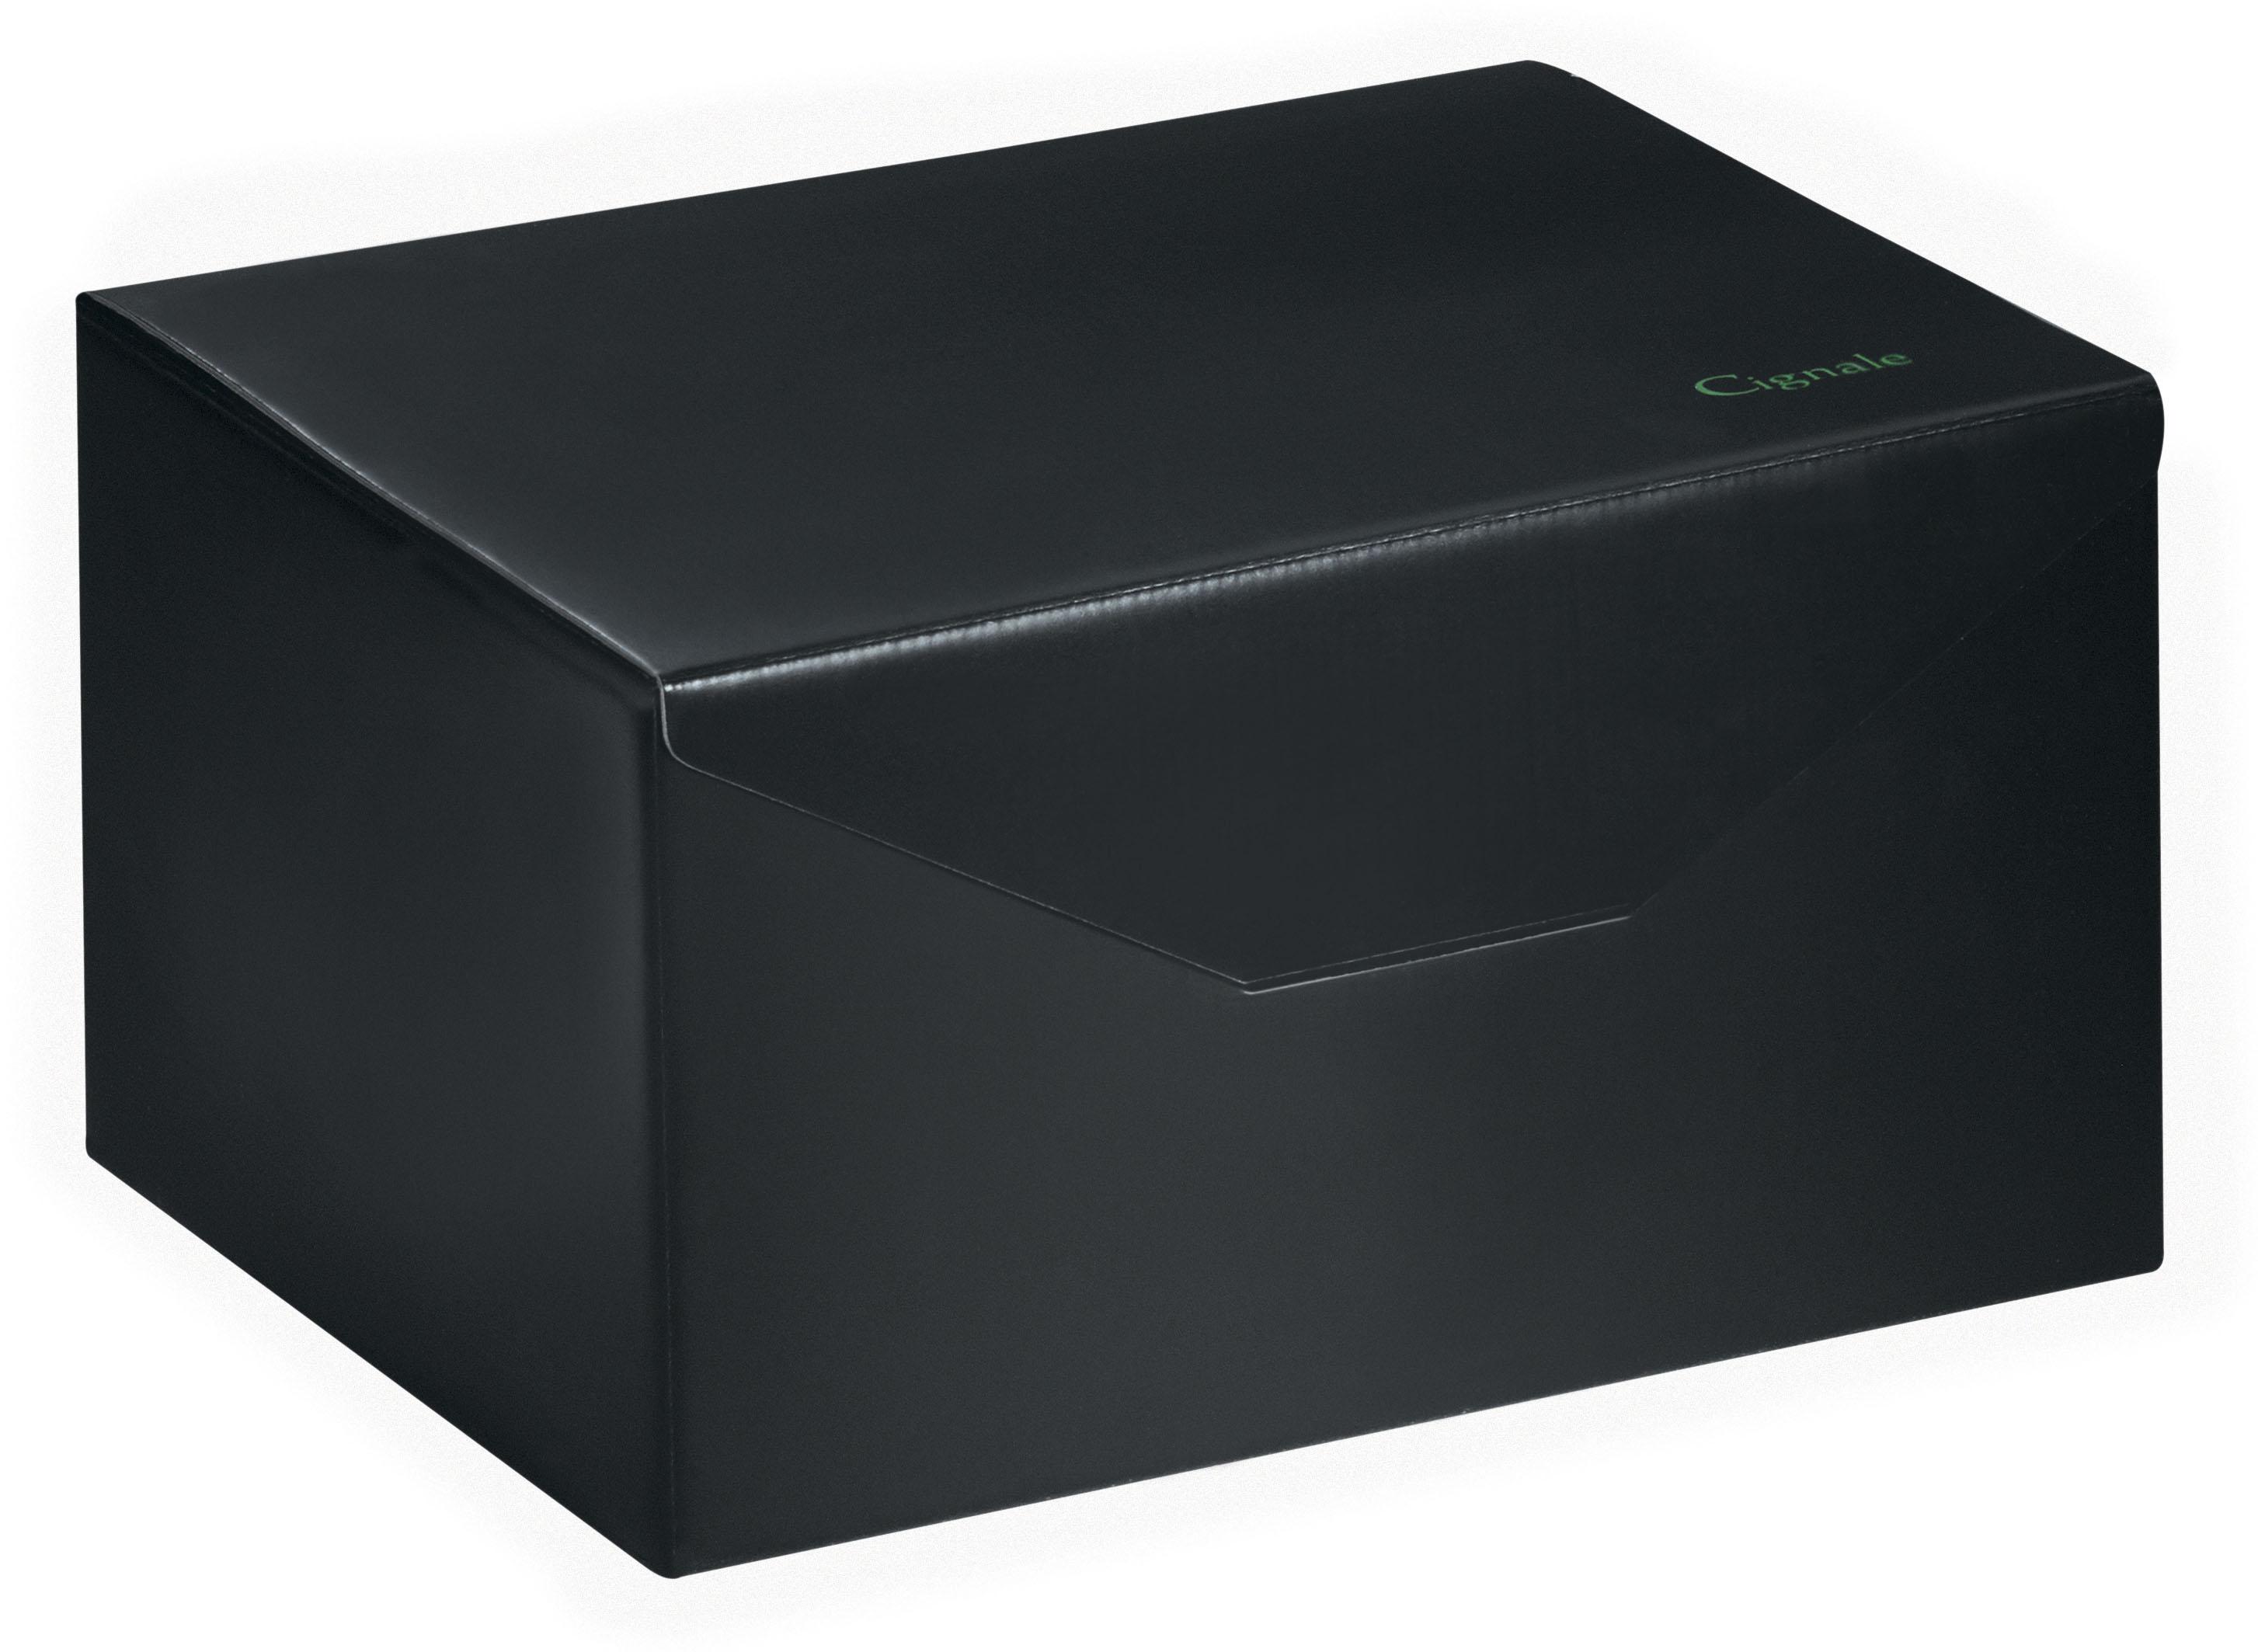 Black Box Wallpapers High Quality